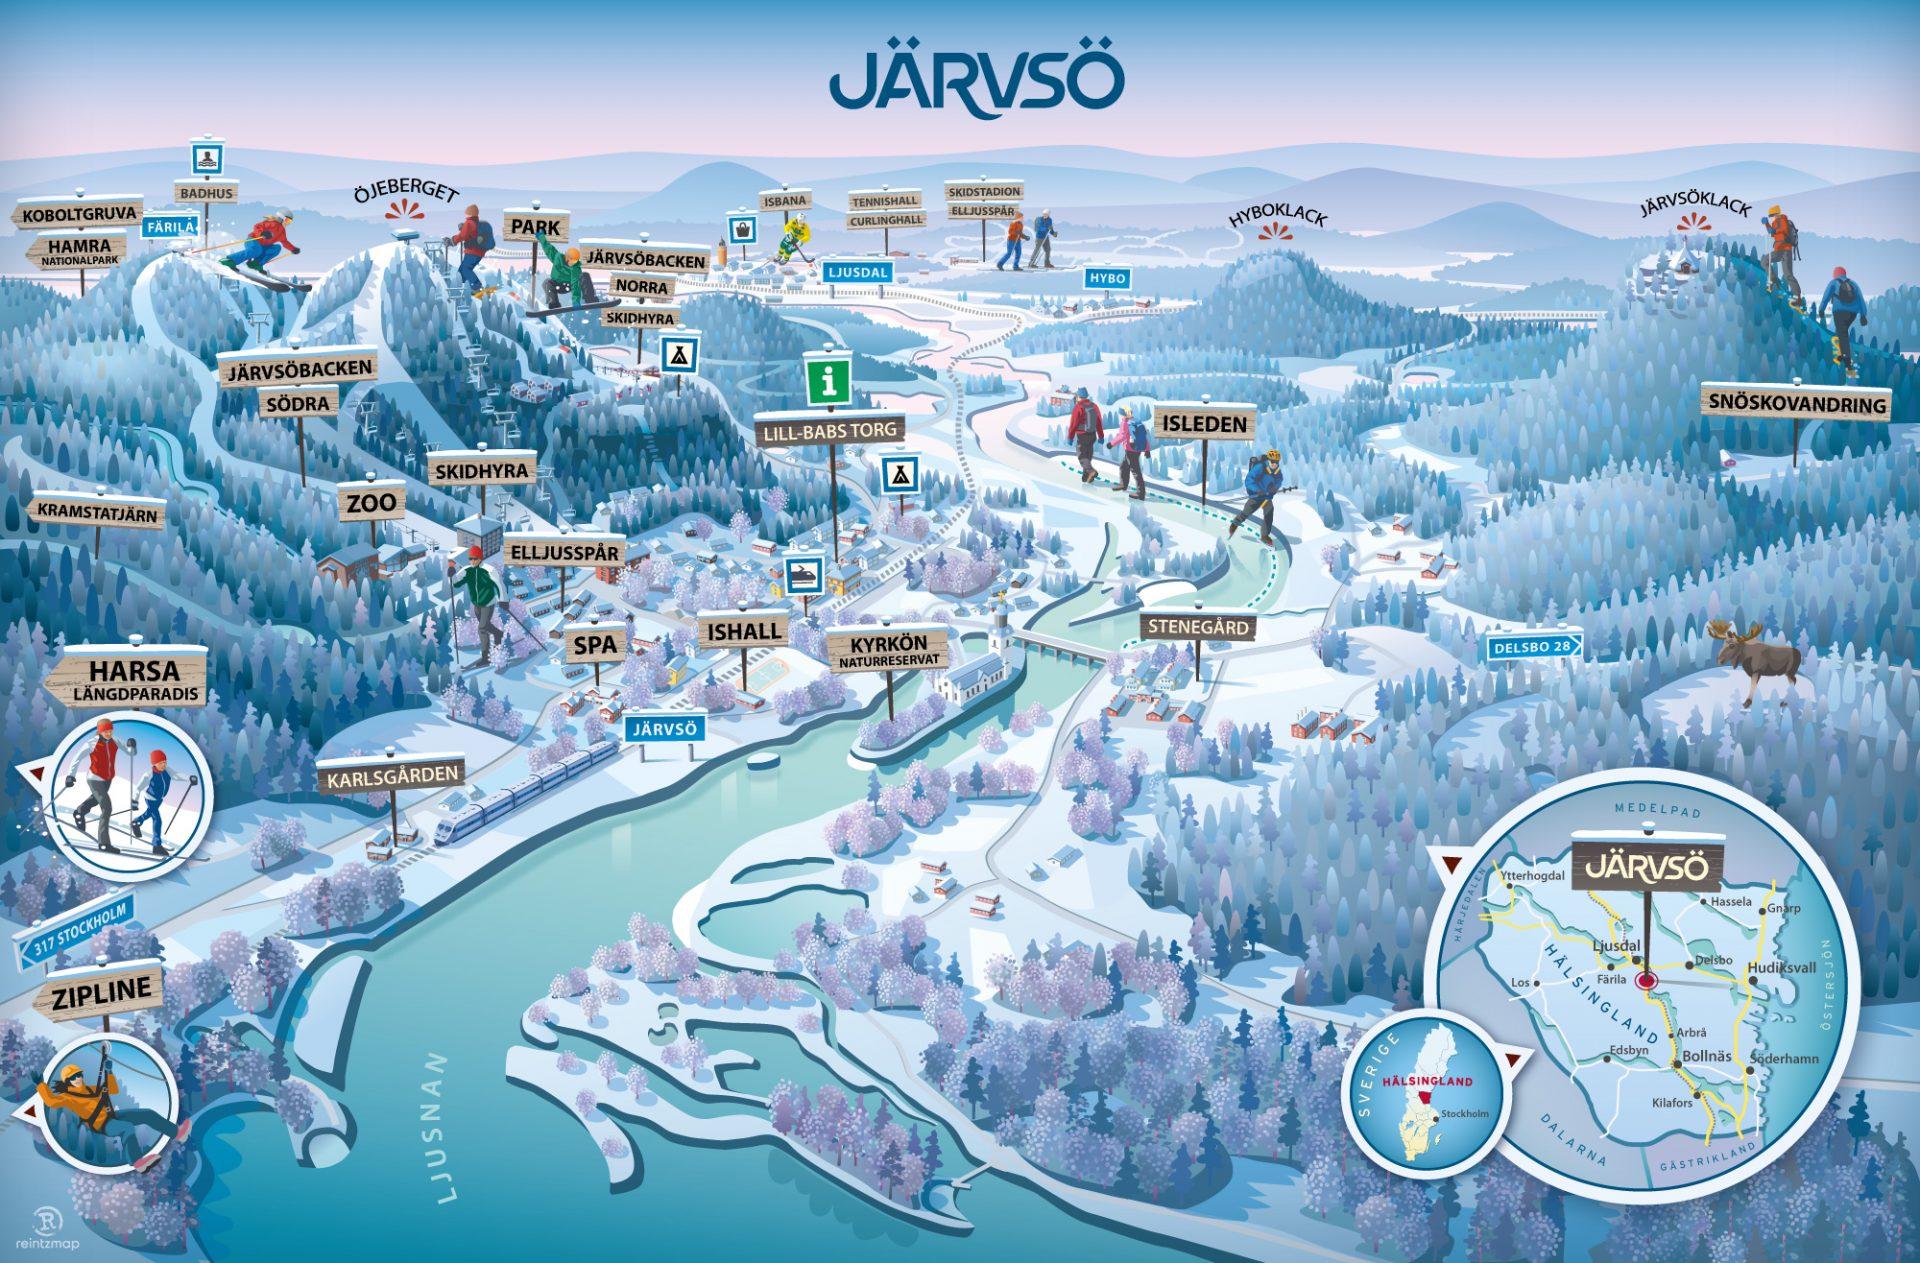 Järvsö Vinter karta